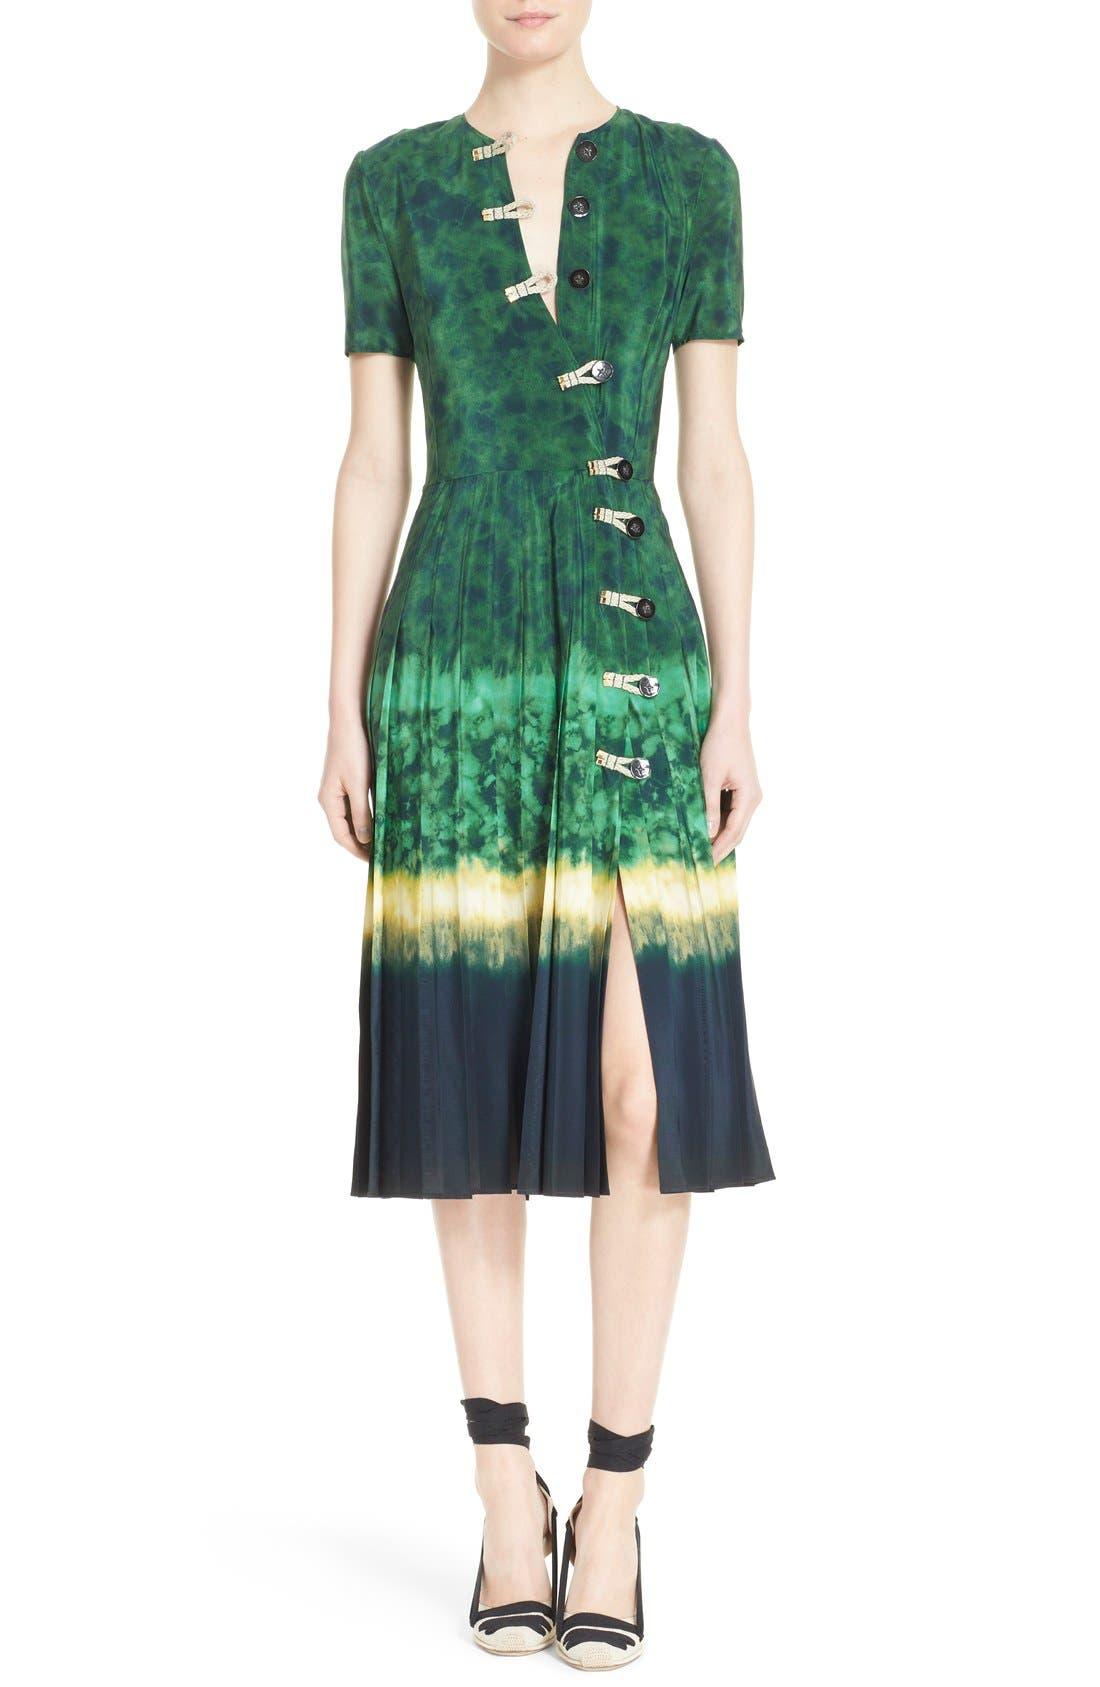 ALTUZARRA, 'Ilari' Rope Closure Dip Dye Dress, Alternate thumbnail 4, color, 340